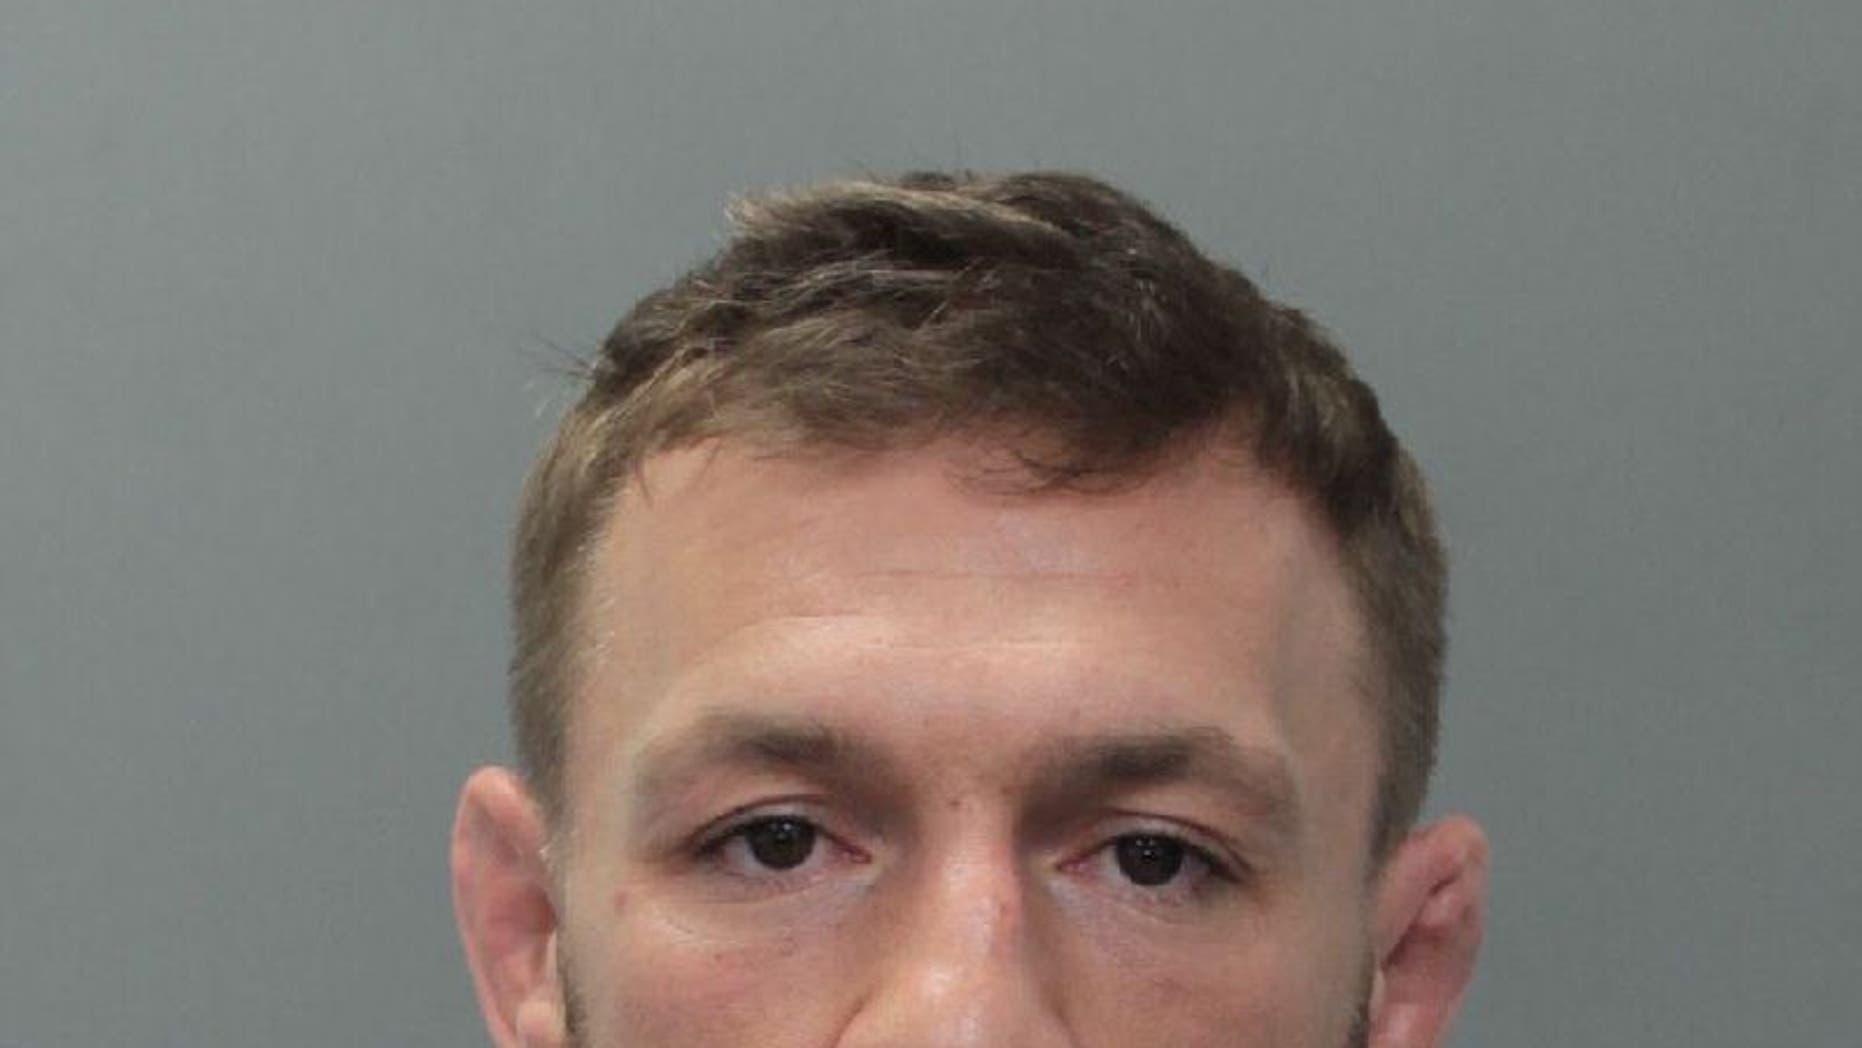 Conor McGregor, 30, was taken into custody in Miami Beach, Florida on Monday, online records show.